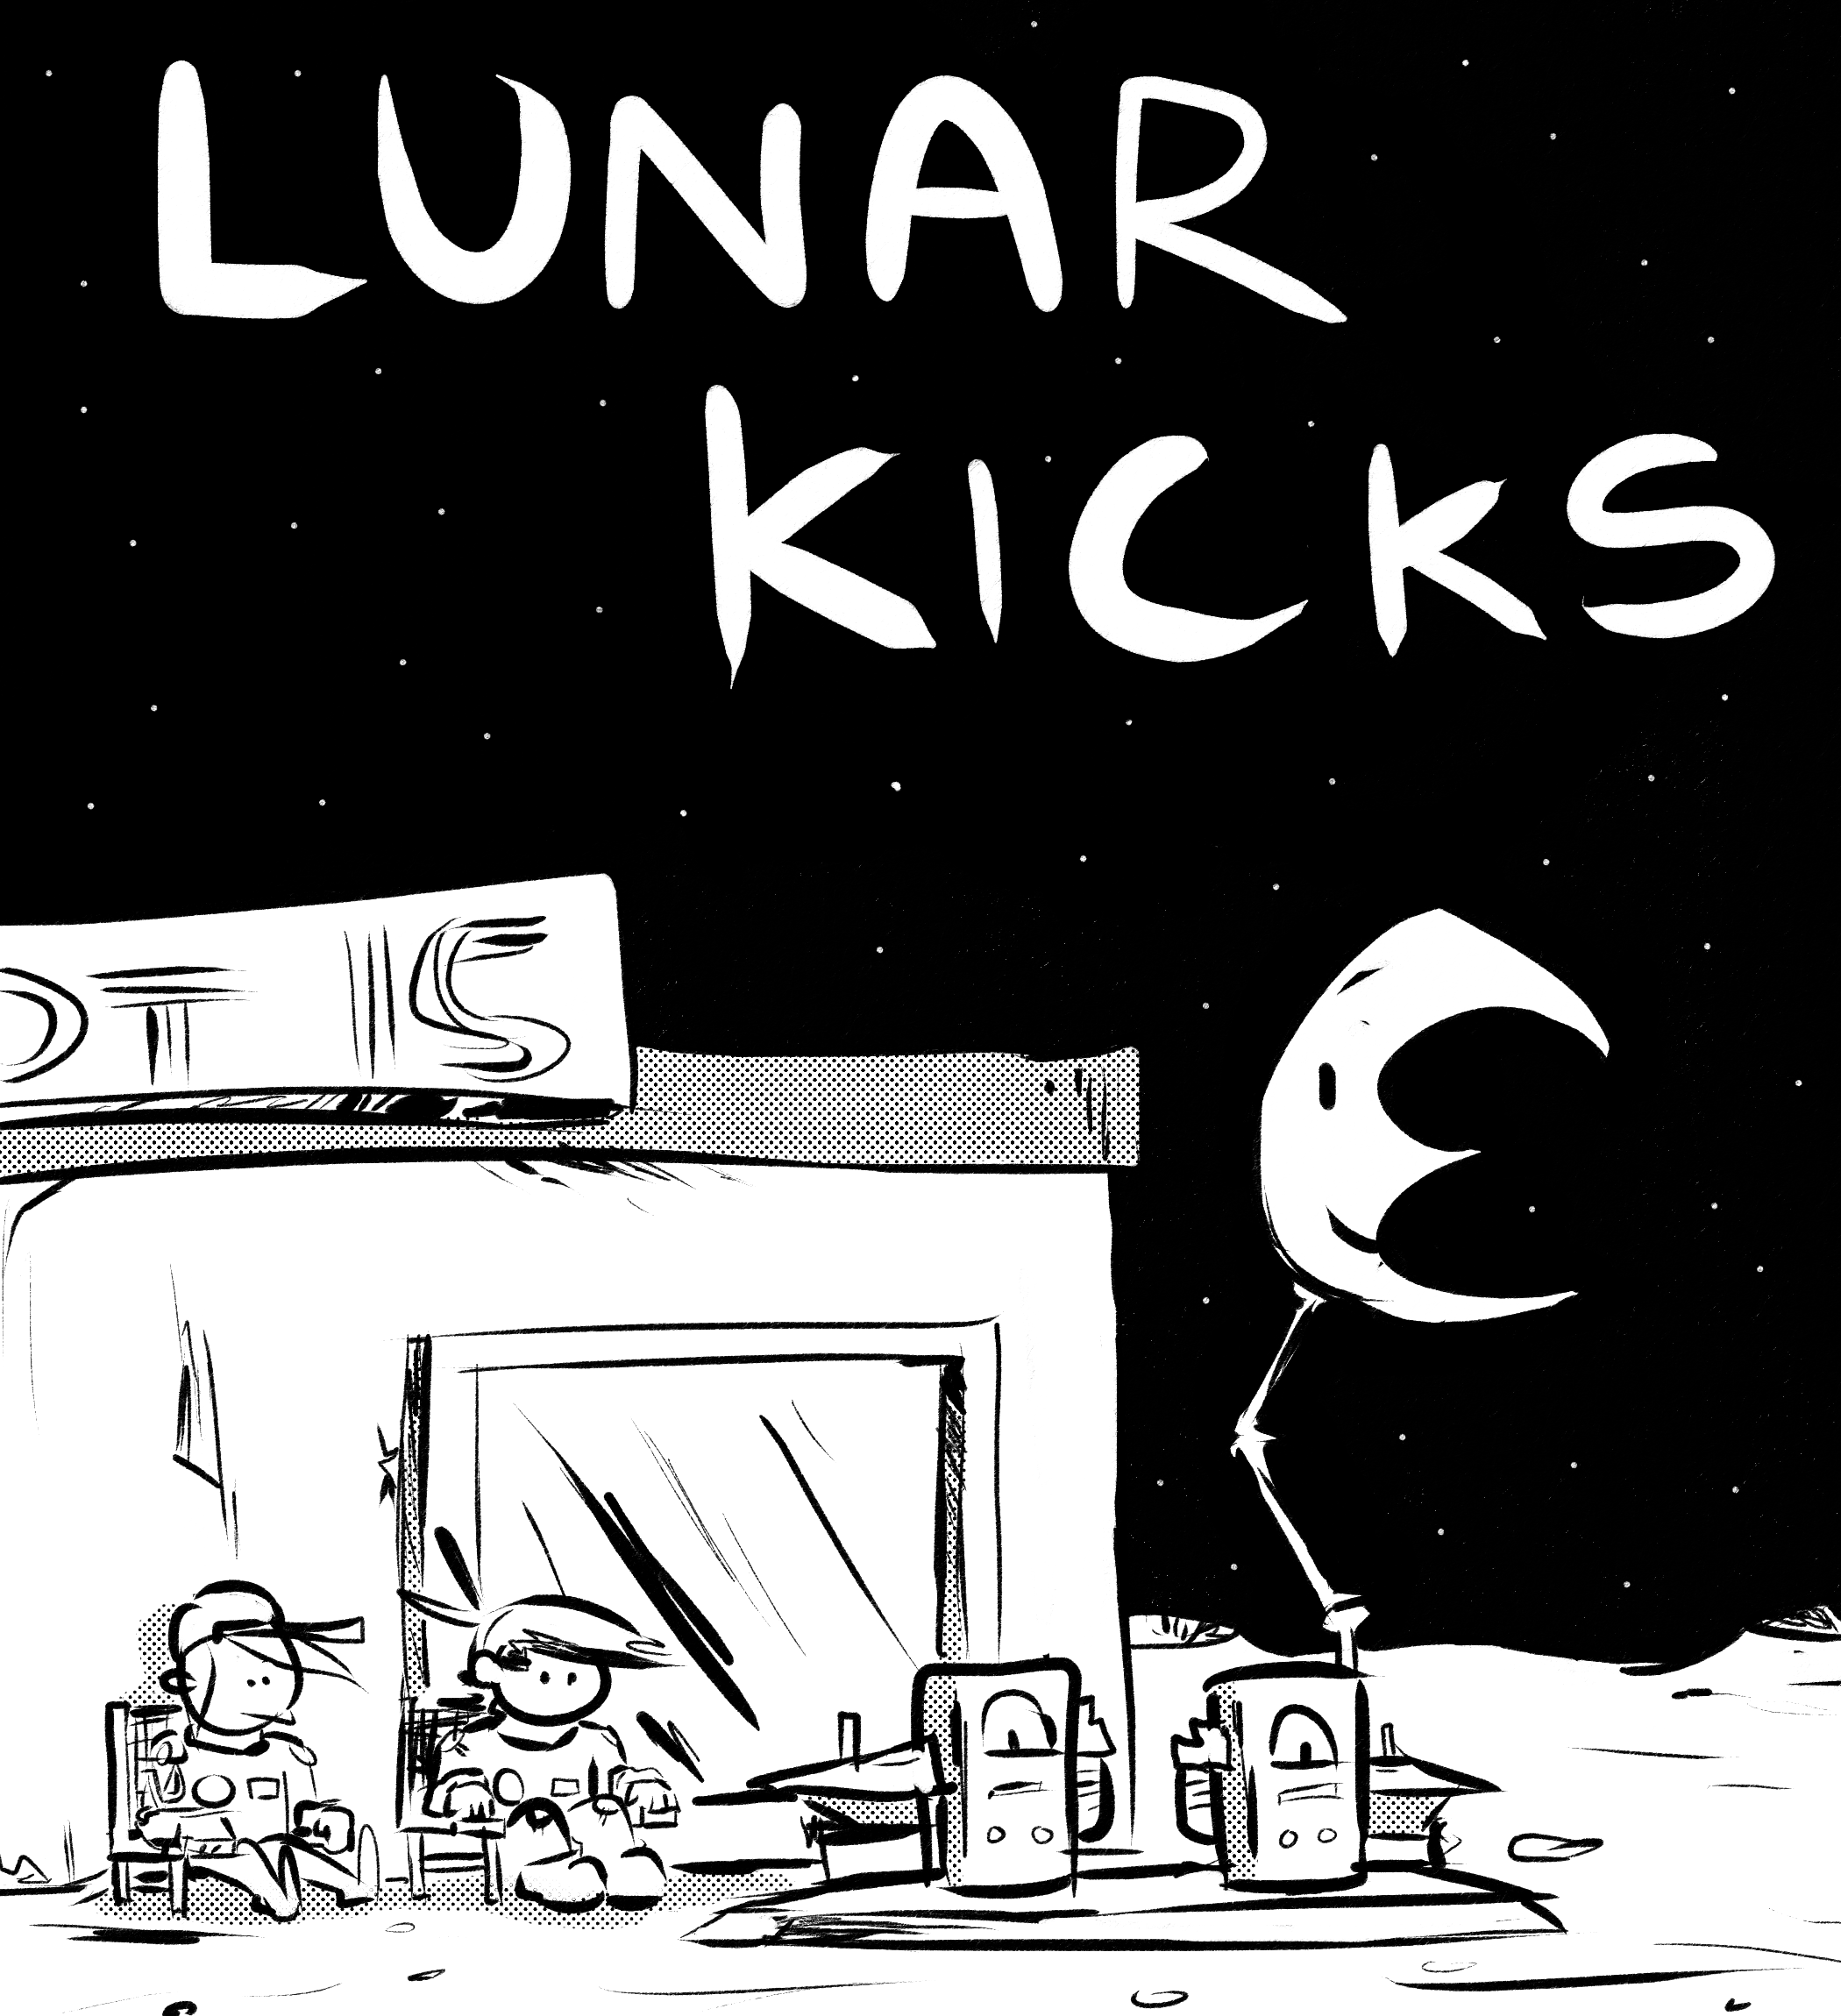 Lunar Kicks